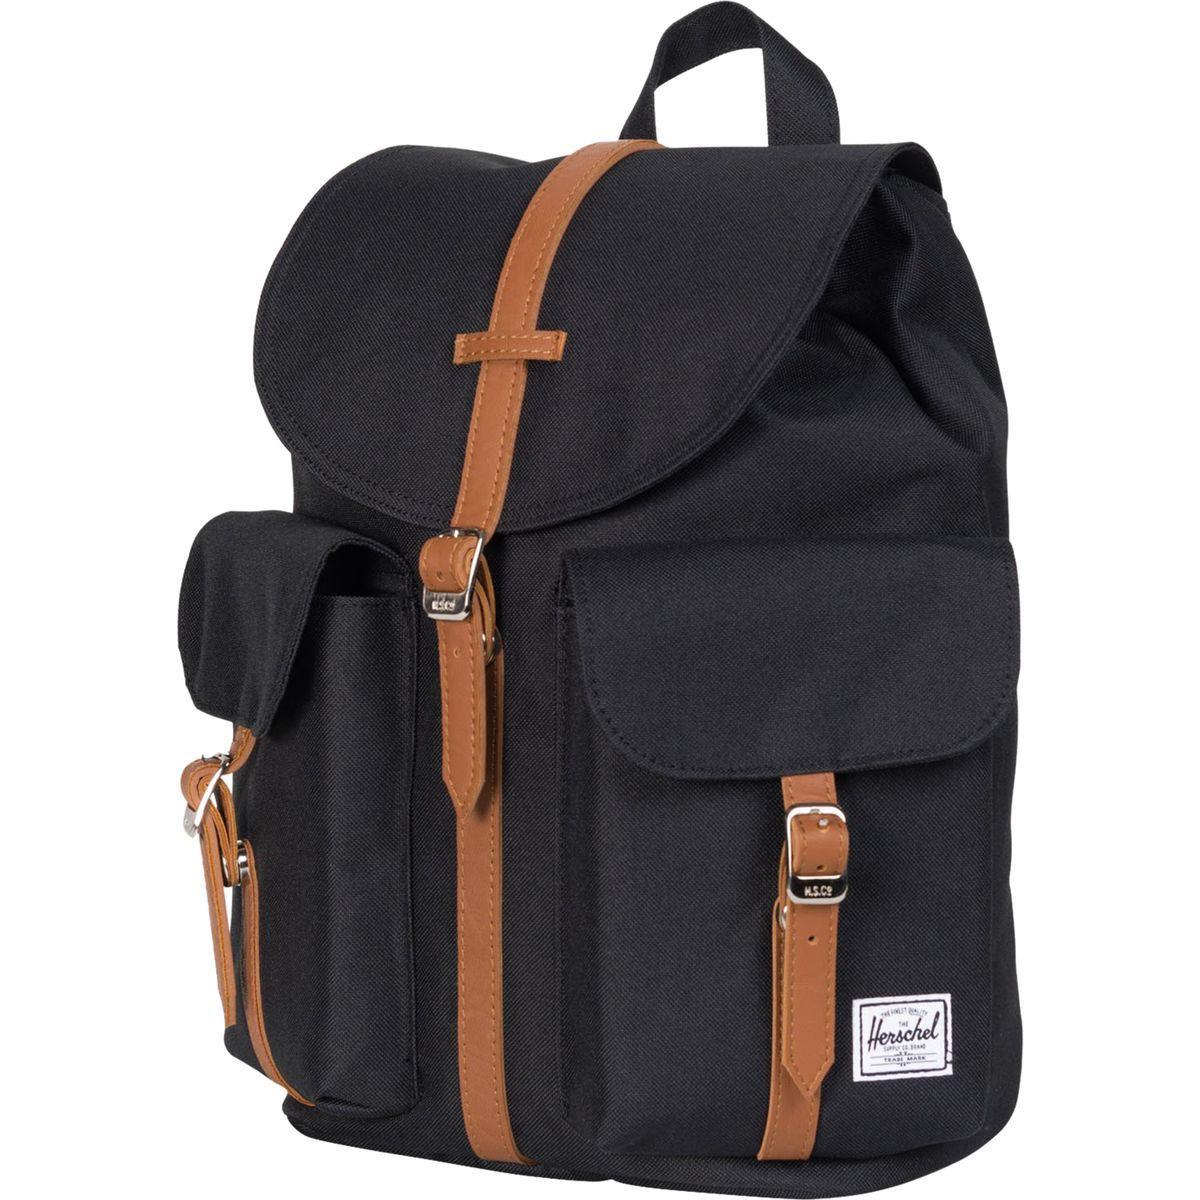 31a2b0cf08ba Lyst - Herschel Supply Co. Dawson 13l Backpack in Black - Save 50%